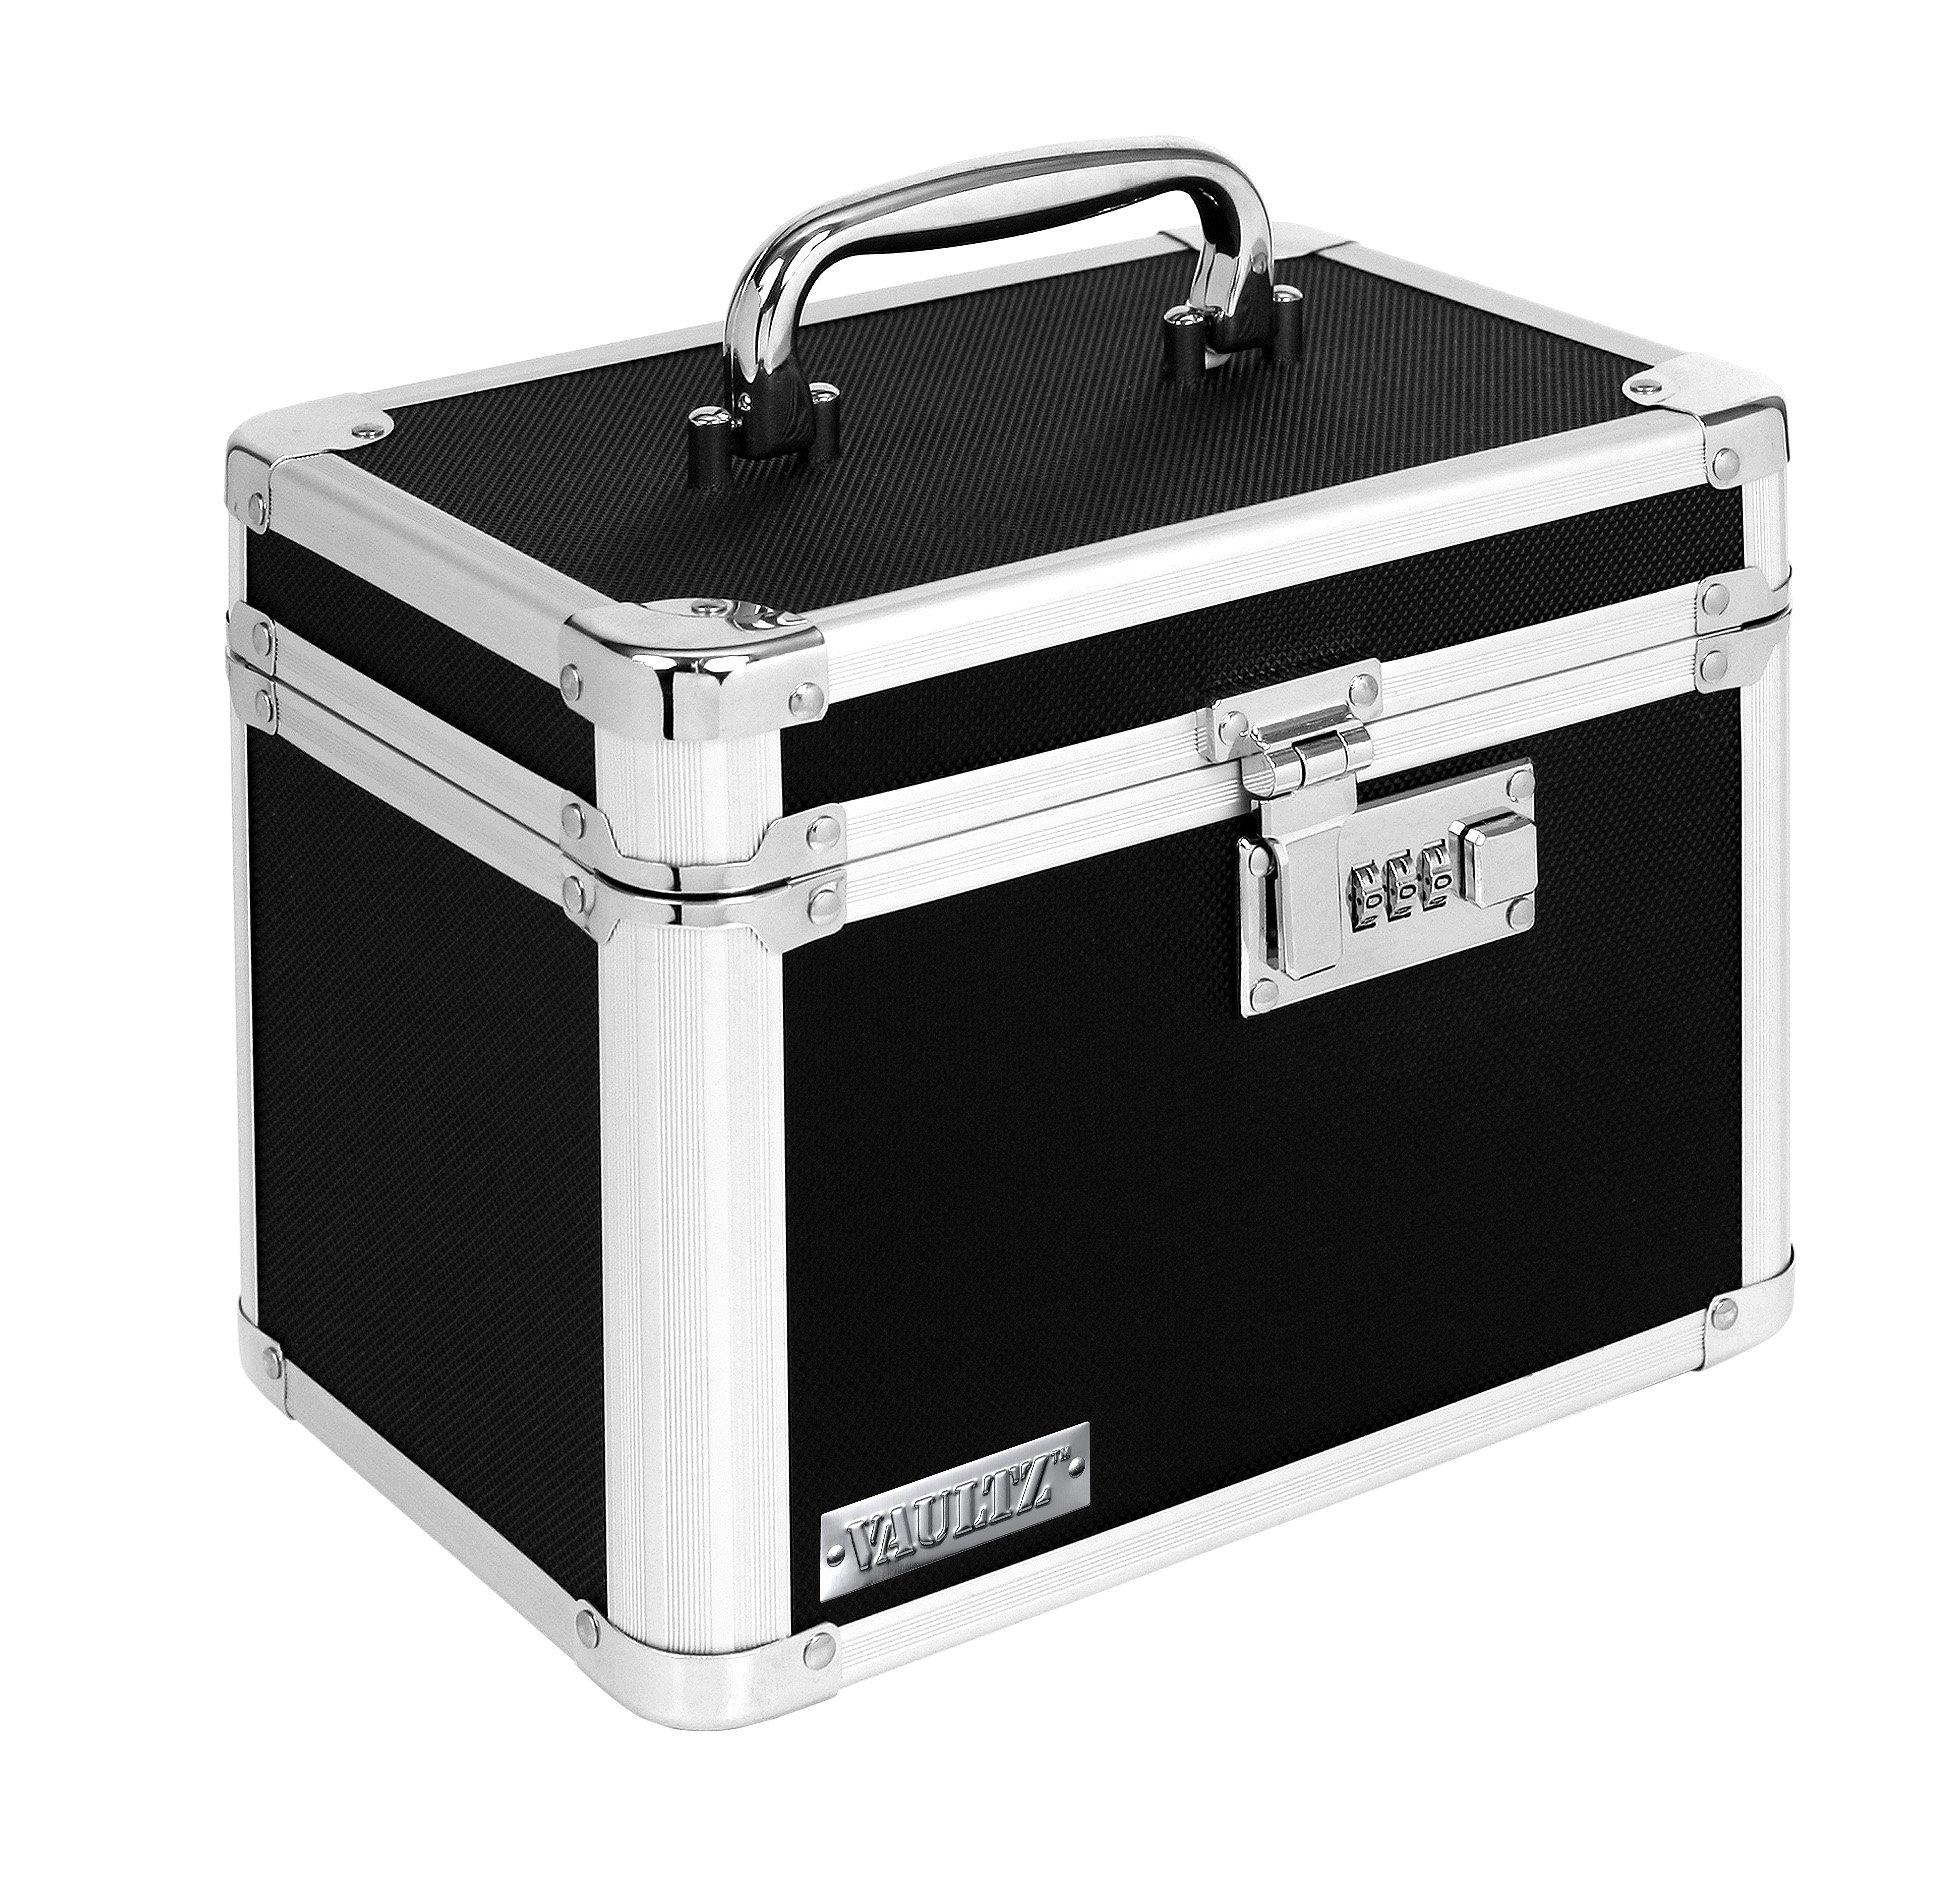 Vaultz Combination Lock Box, 7.75 x 7.25 x 10 Inches, Black (VZ00102-2) by Vaultz